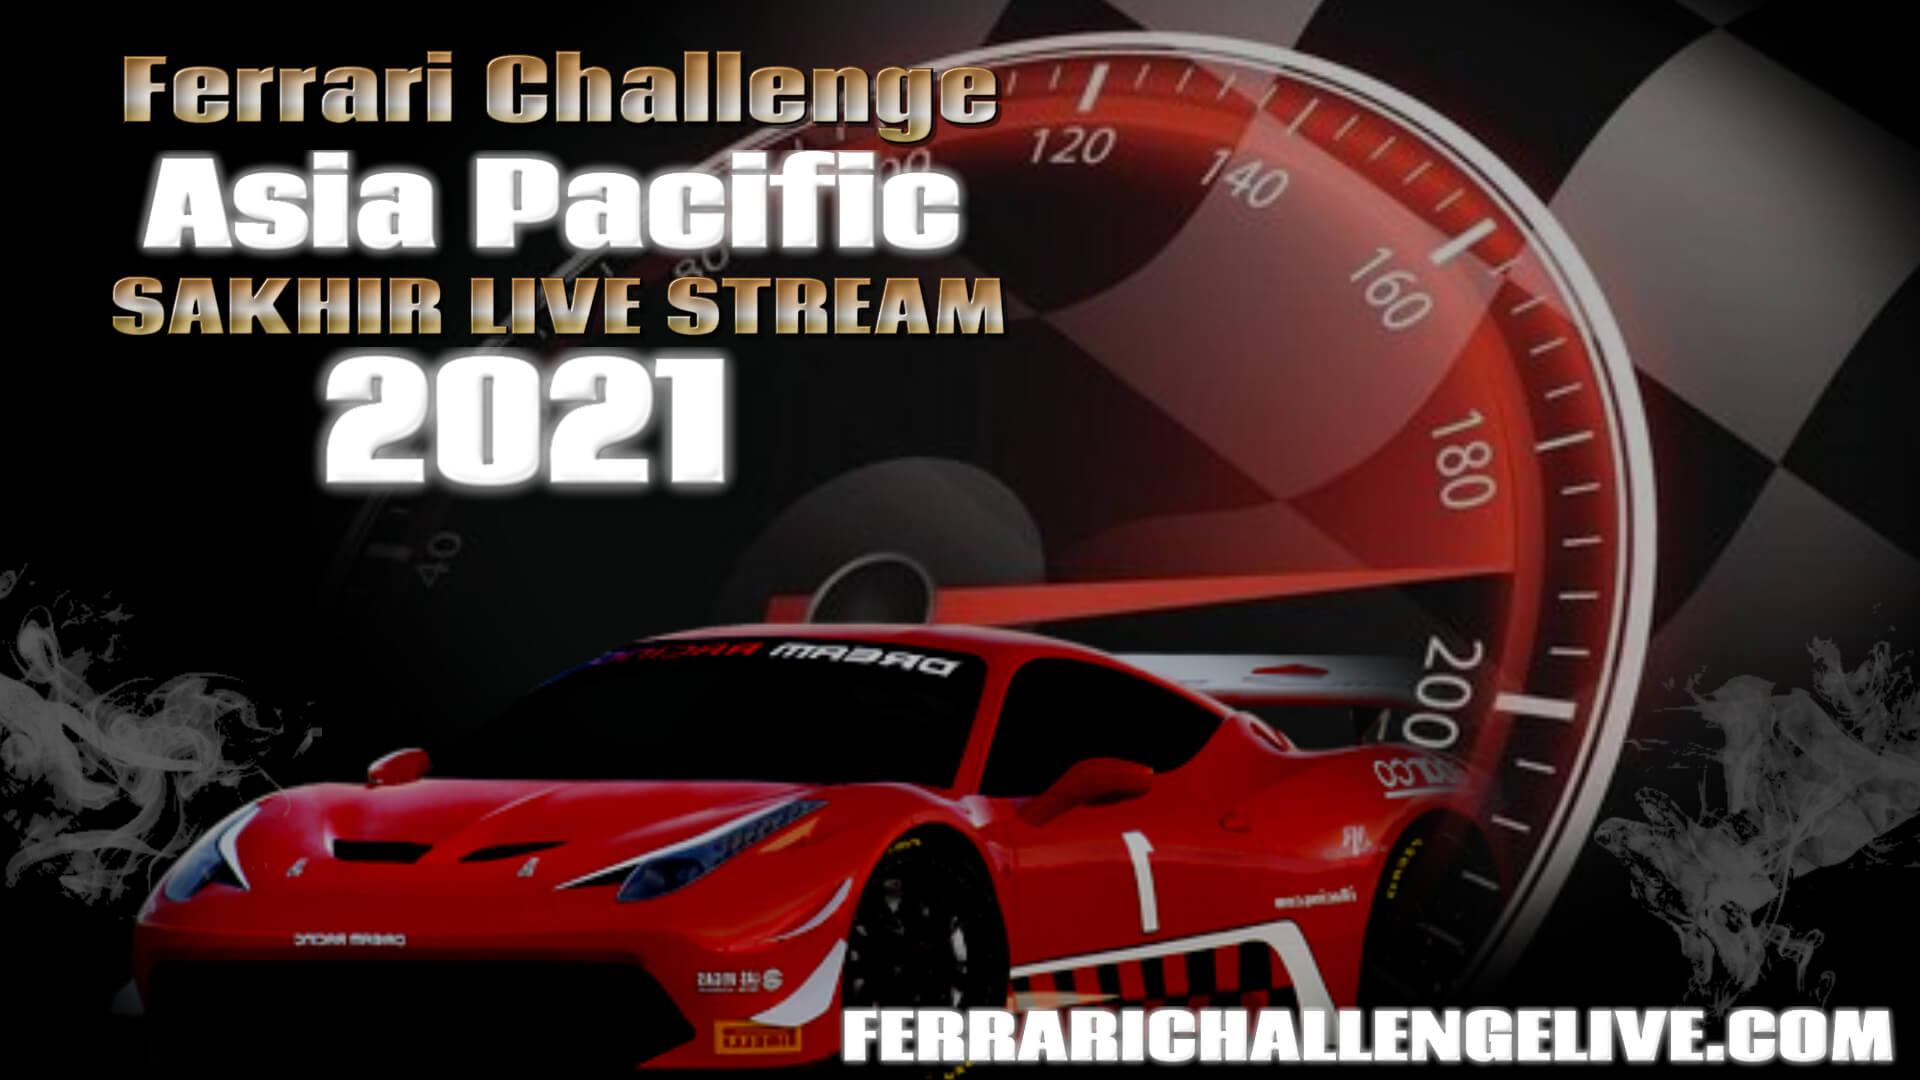 Sakhir Live Stream 2021 | Ferrari Challenge Asia Pacific